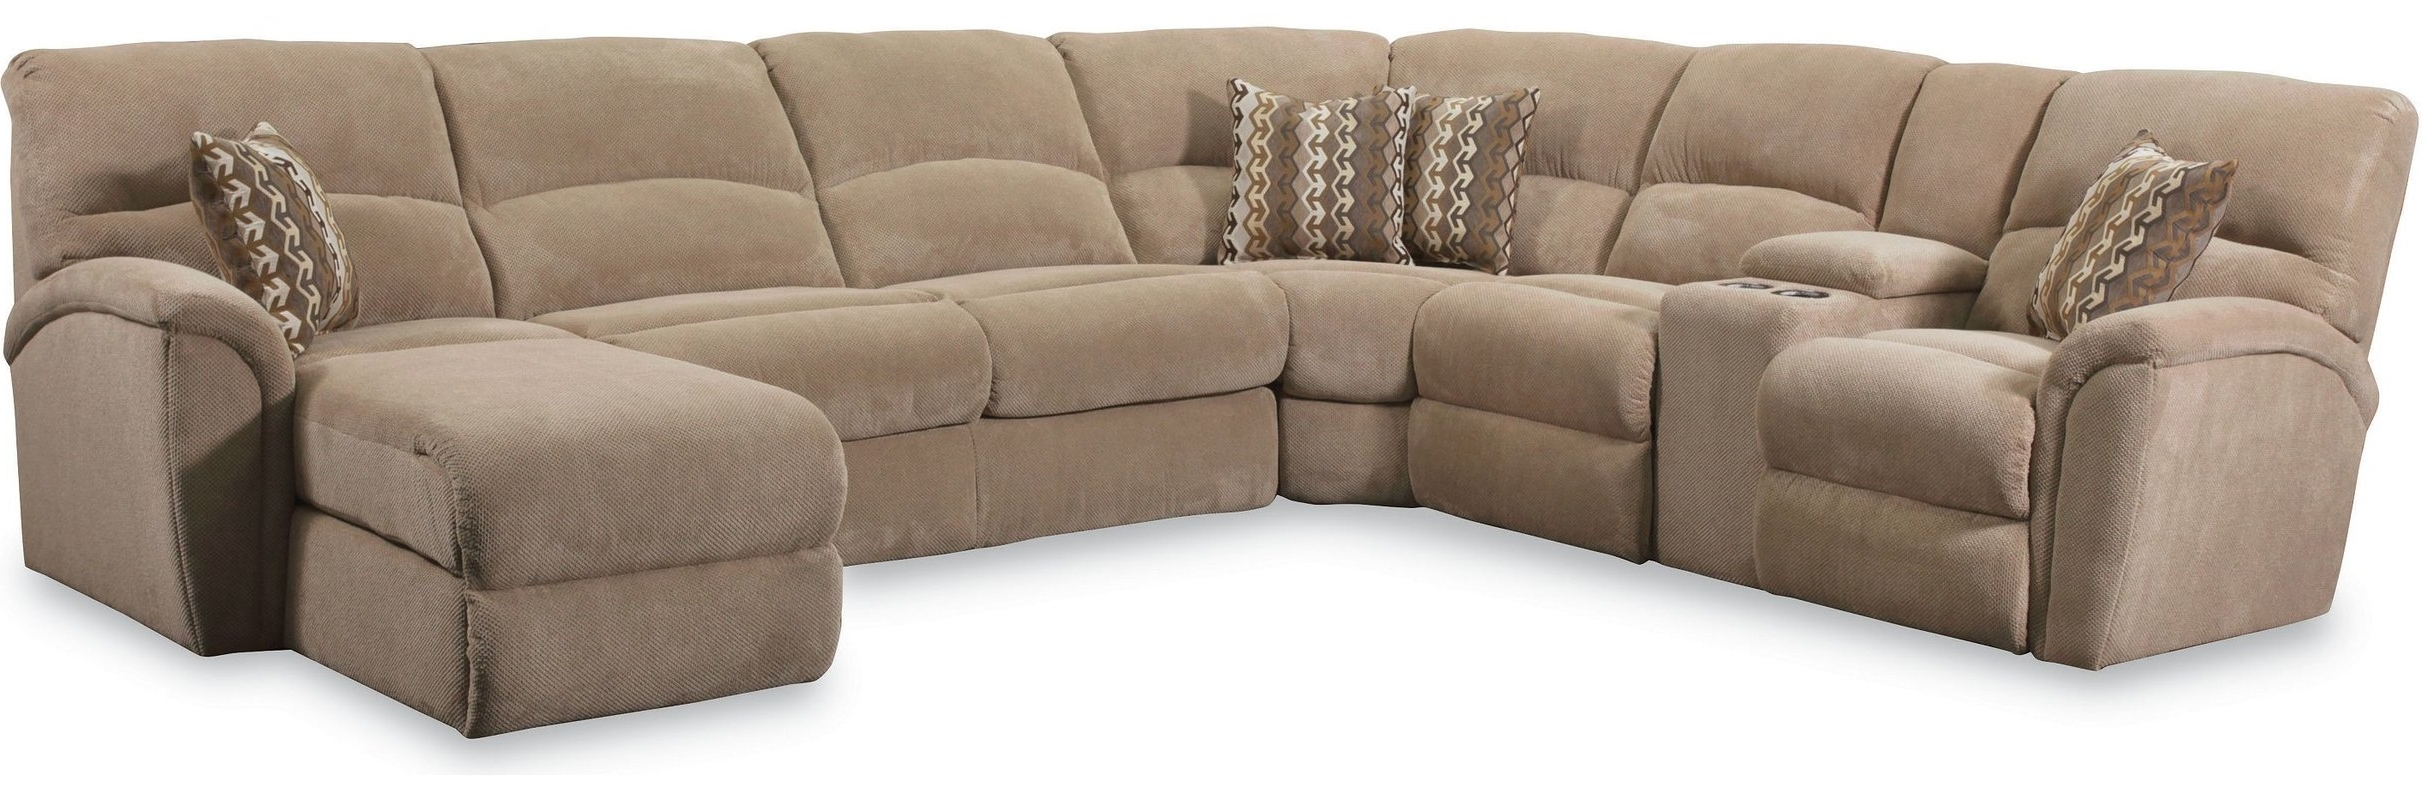 Lane Furniture Grand Torino Reclining Sectional & Reviews (View 12 of 20)